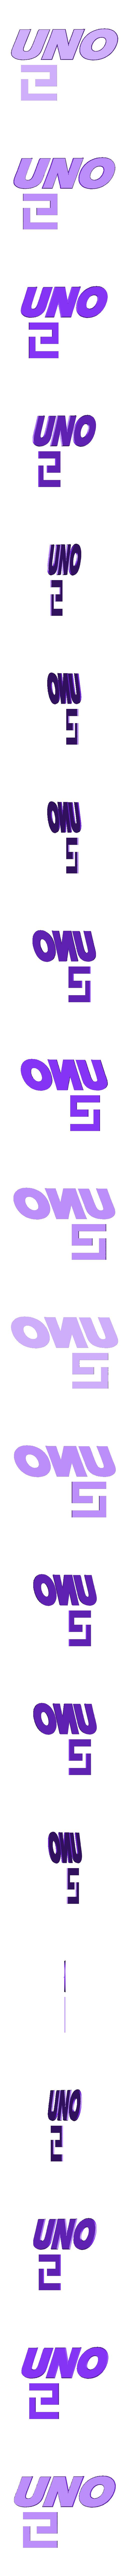 UnoAndLogo.stl Download free STL file UNO R3 Case • Object to 3D print, menkheperra